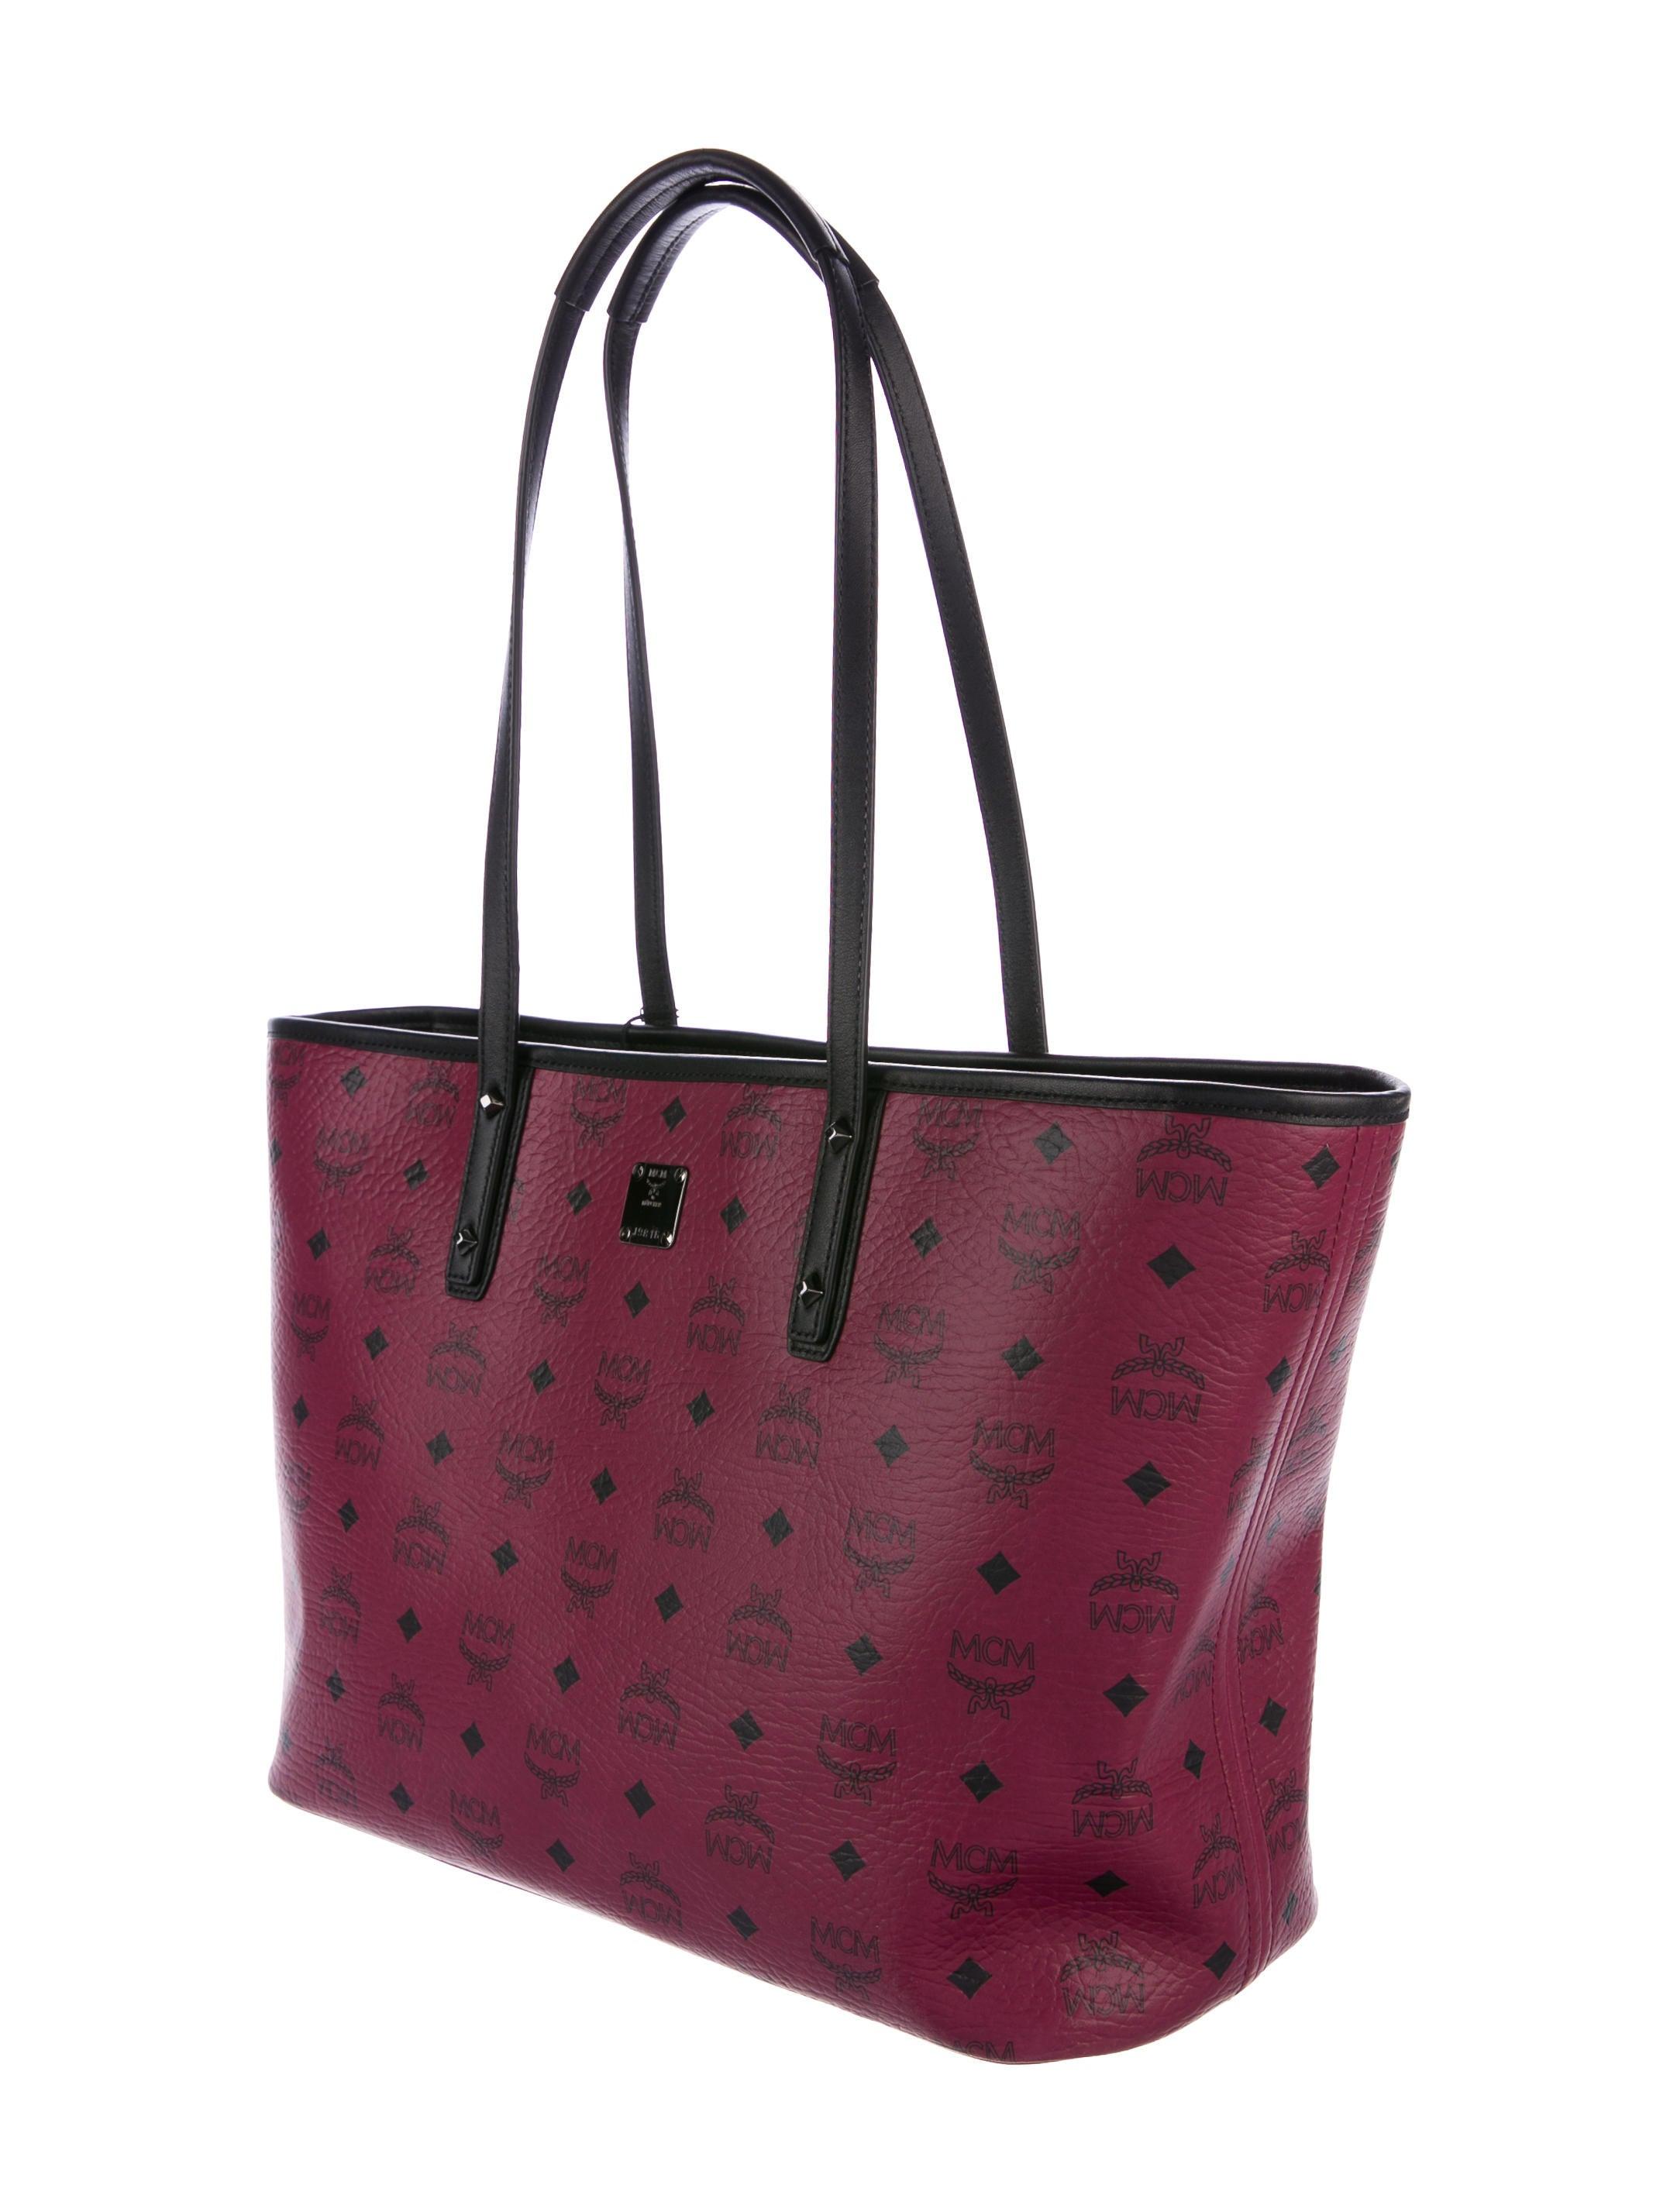 mcm medium visetos shopper tote w tags handbags. Black Bedroom Furniture Sets. Home Design Ideas